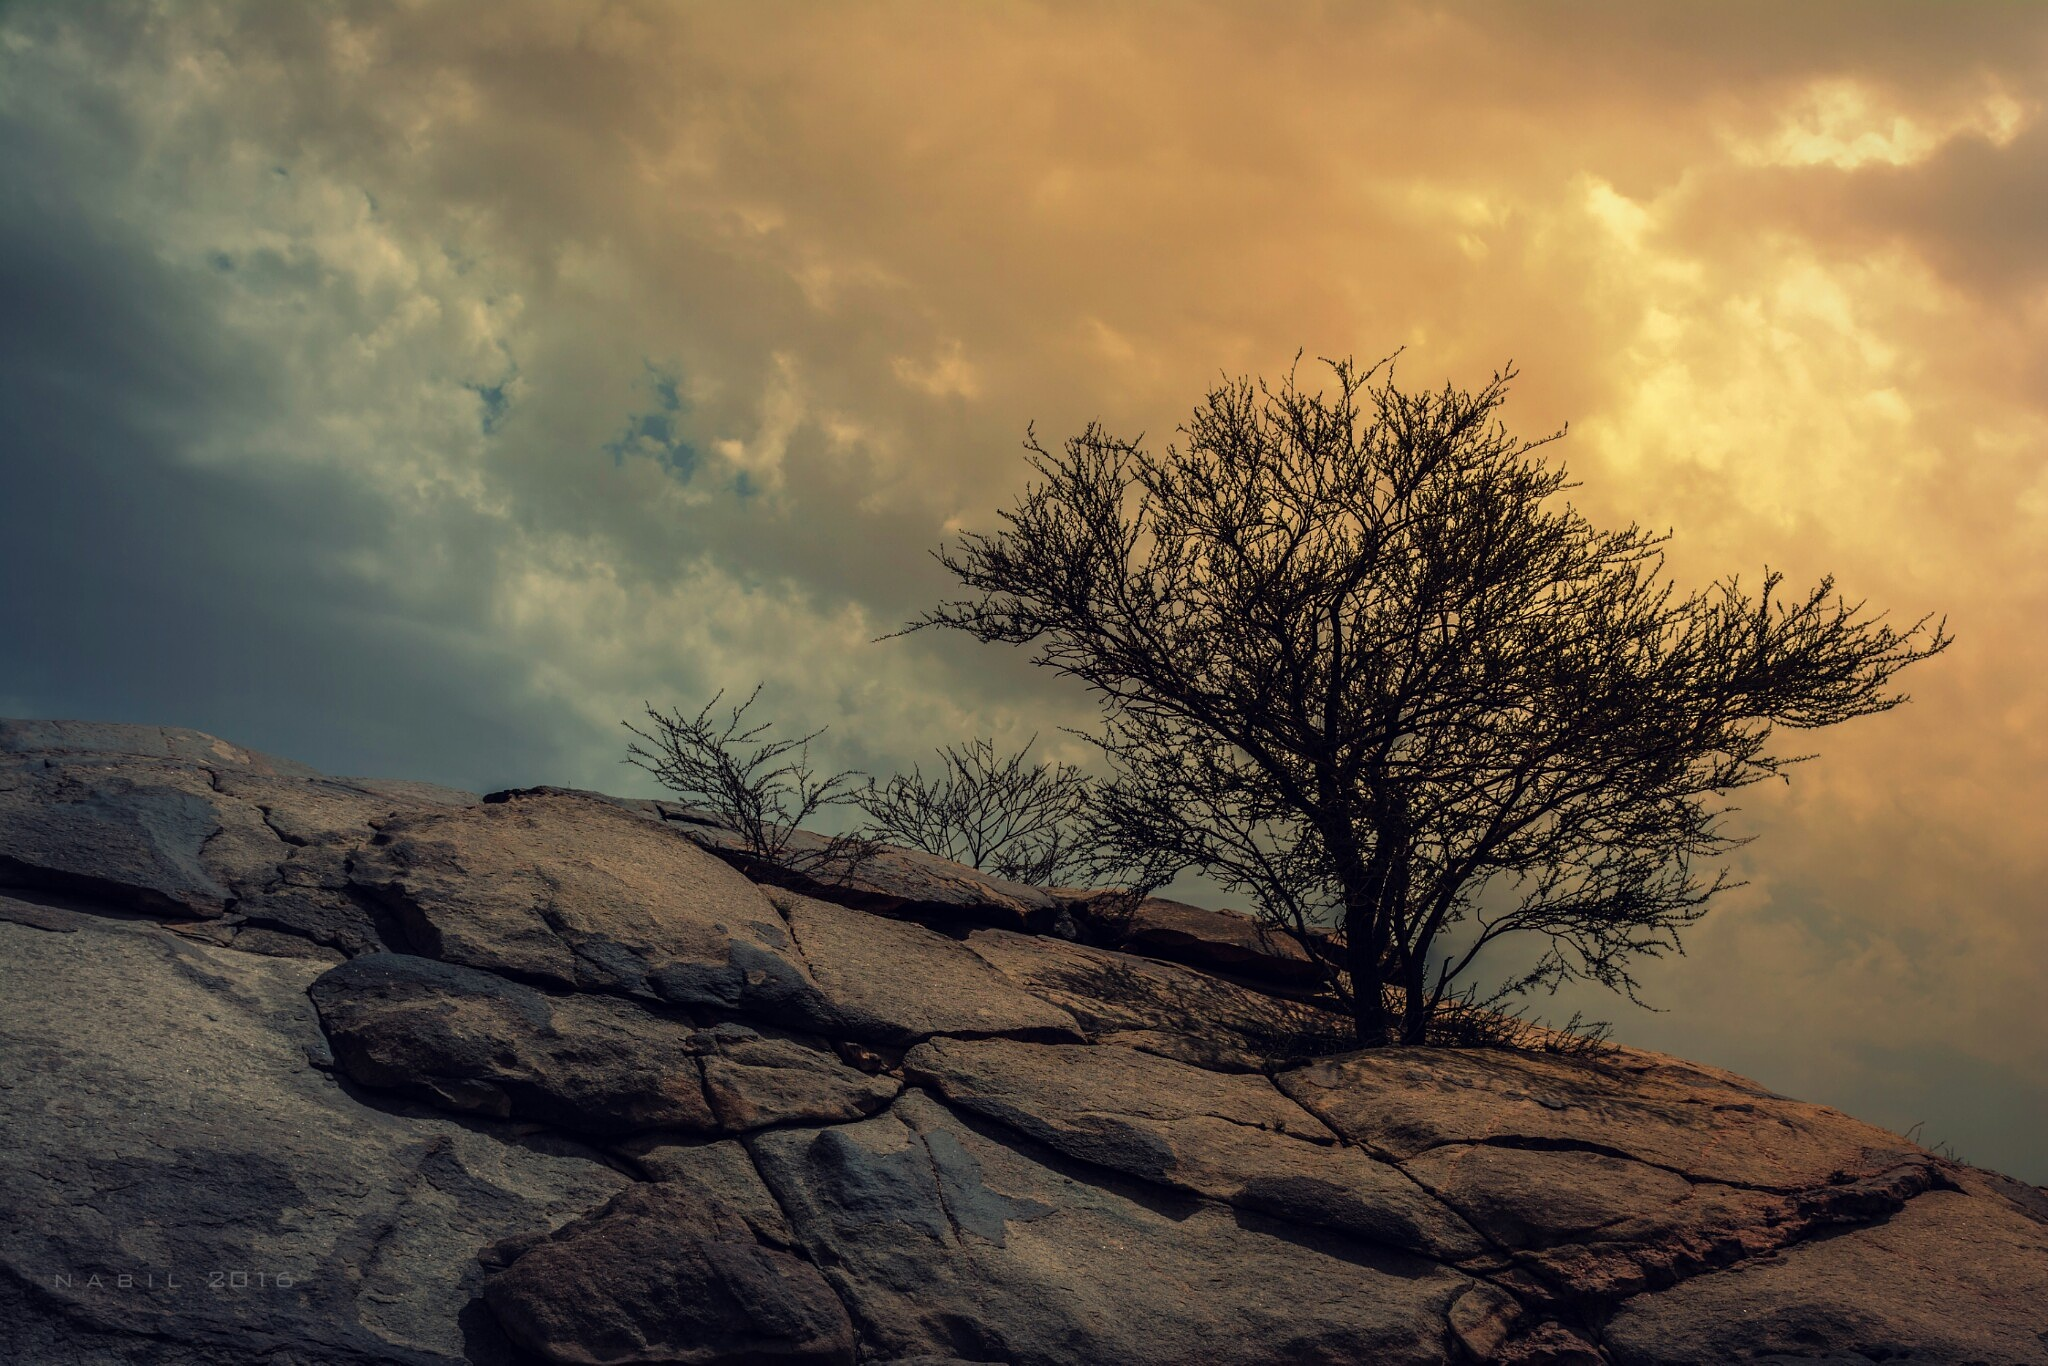 Untitled by Nabil Elsherif